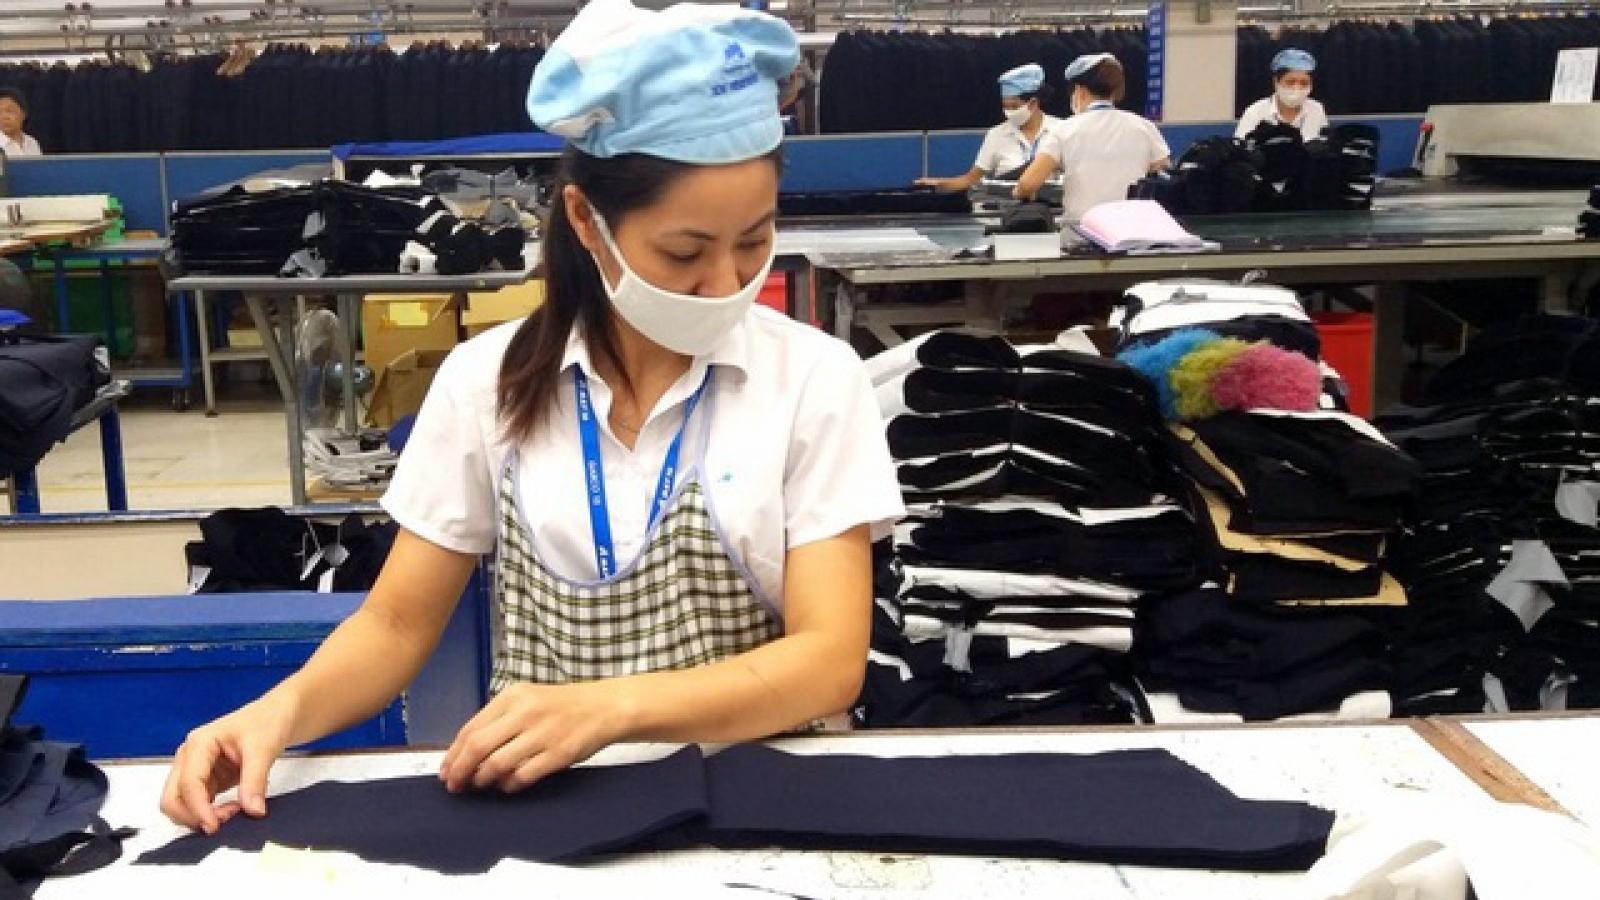 Women spend 20.2 hours per week on chores: ILO Vietnam